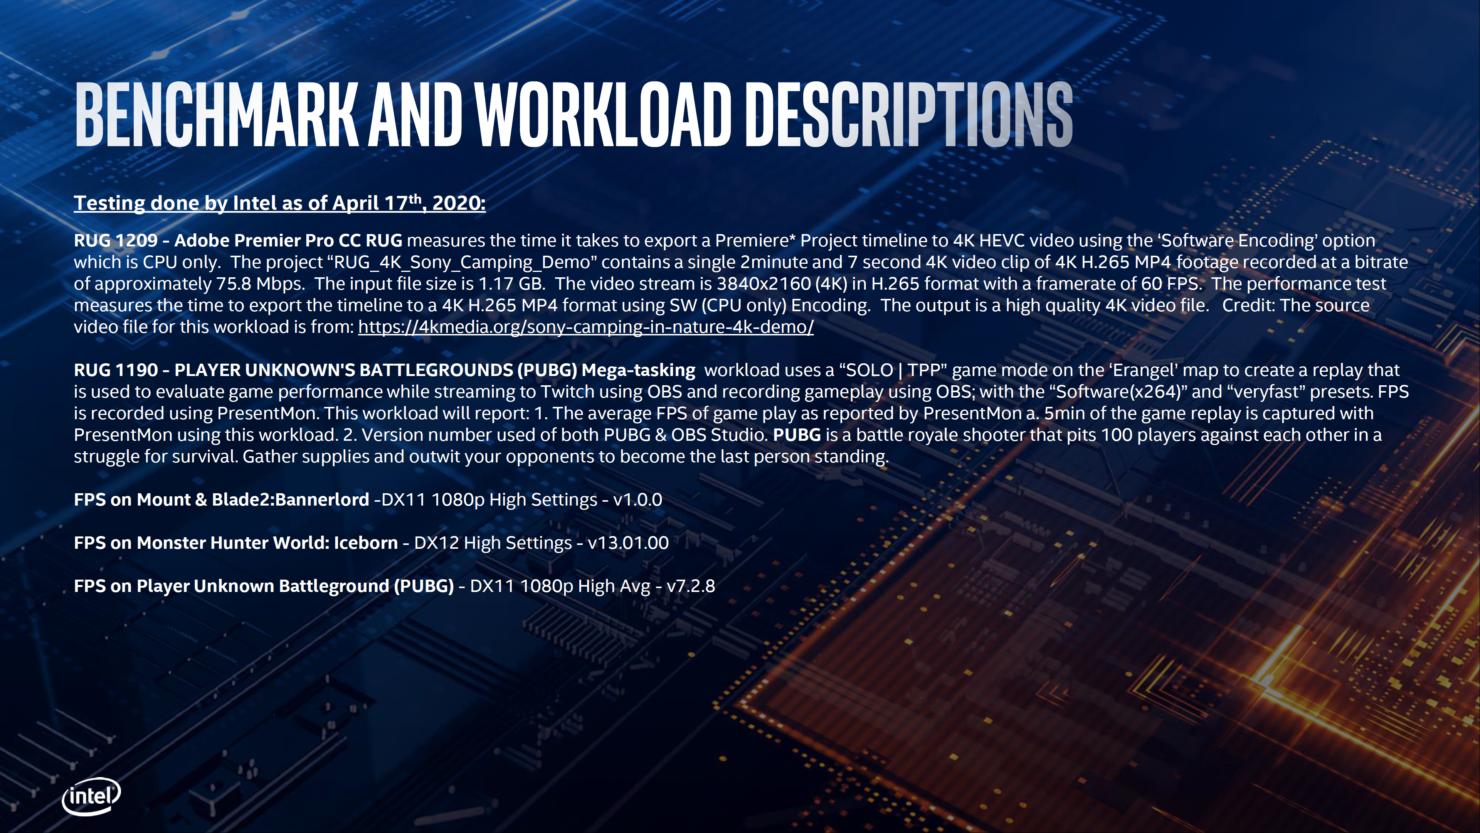 intel-10th-gen-comet-lake-s-desktop-cpu-z490-platform-official-launch_23